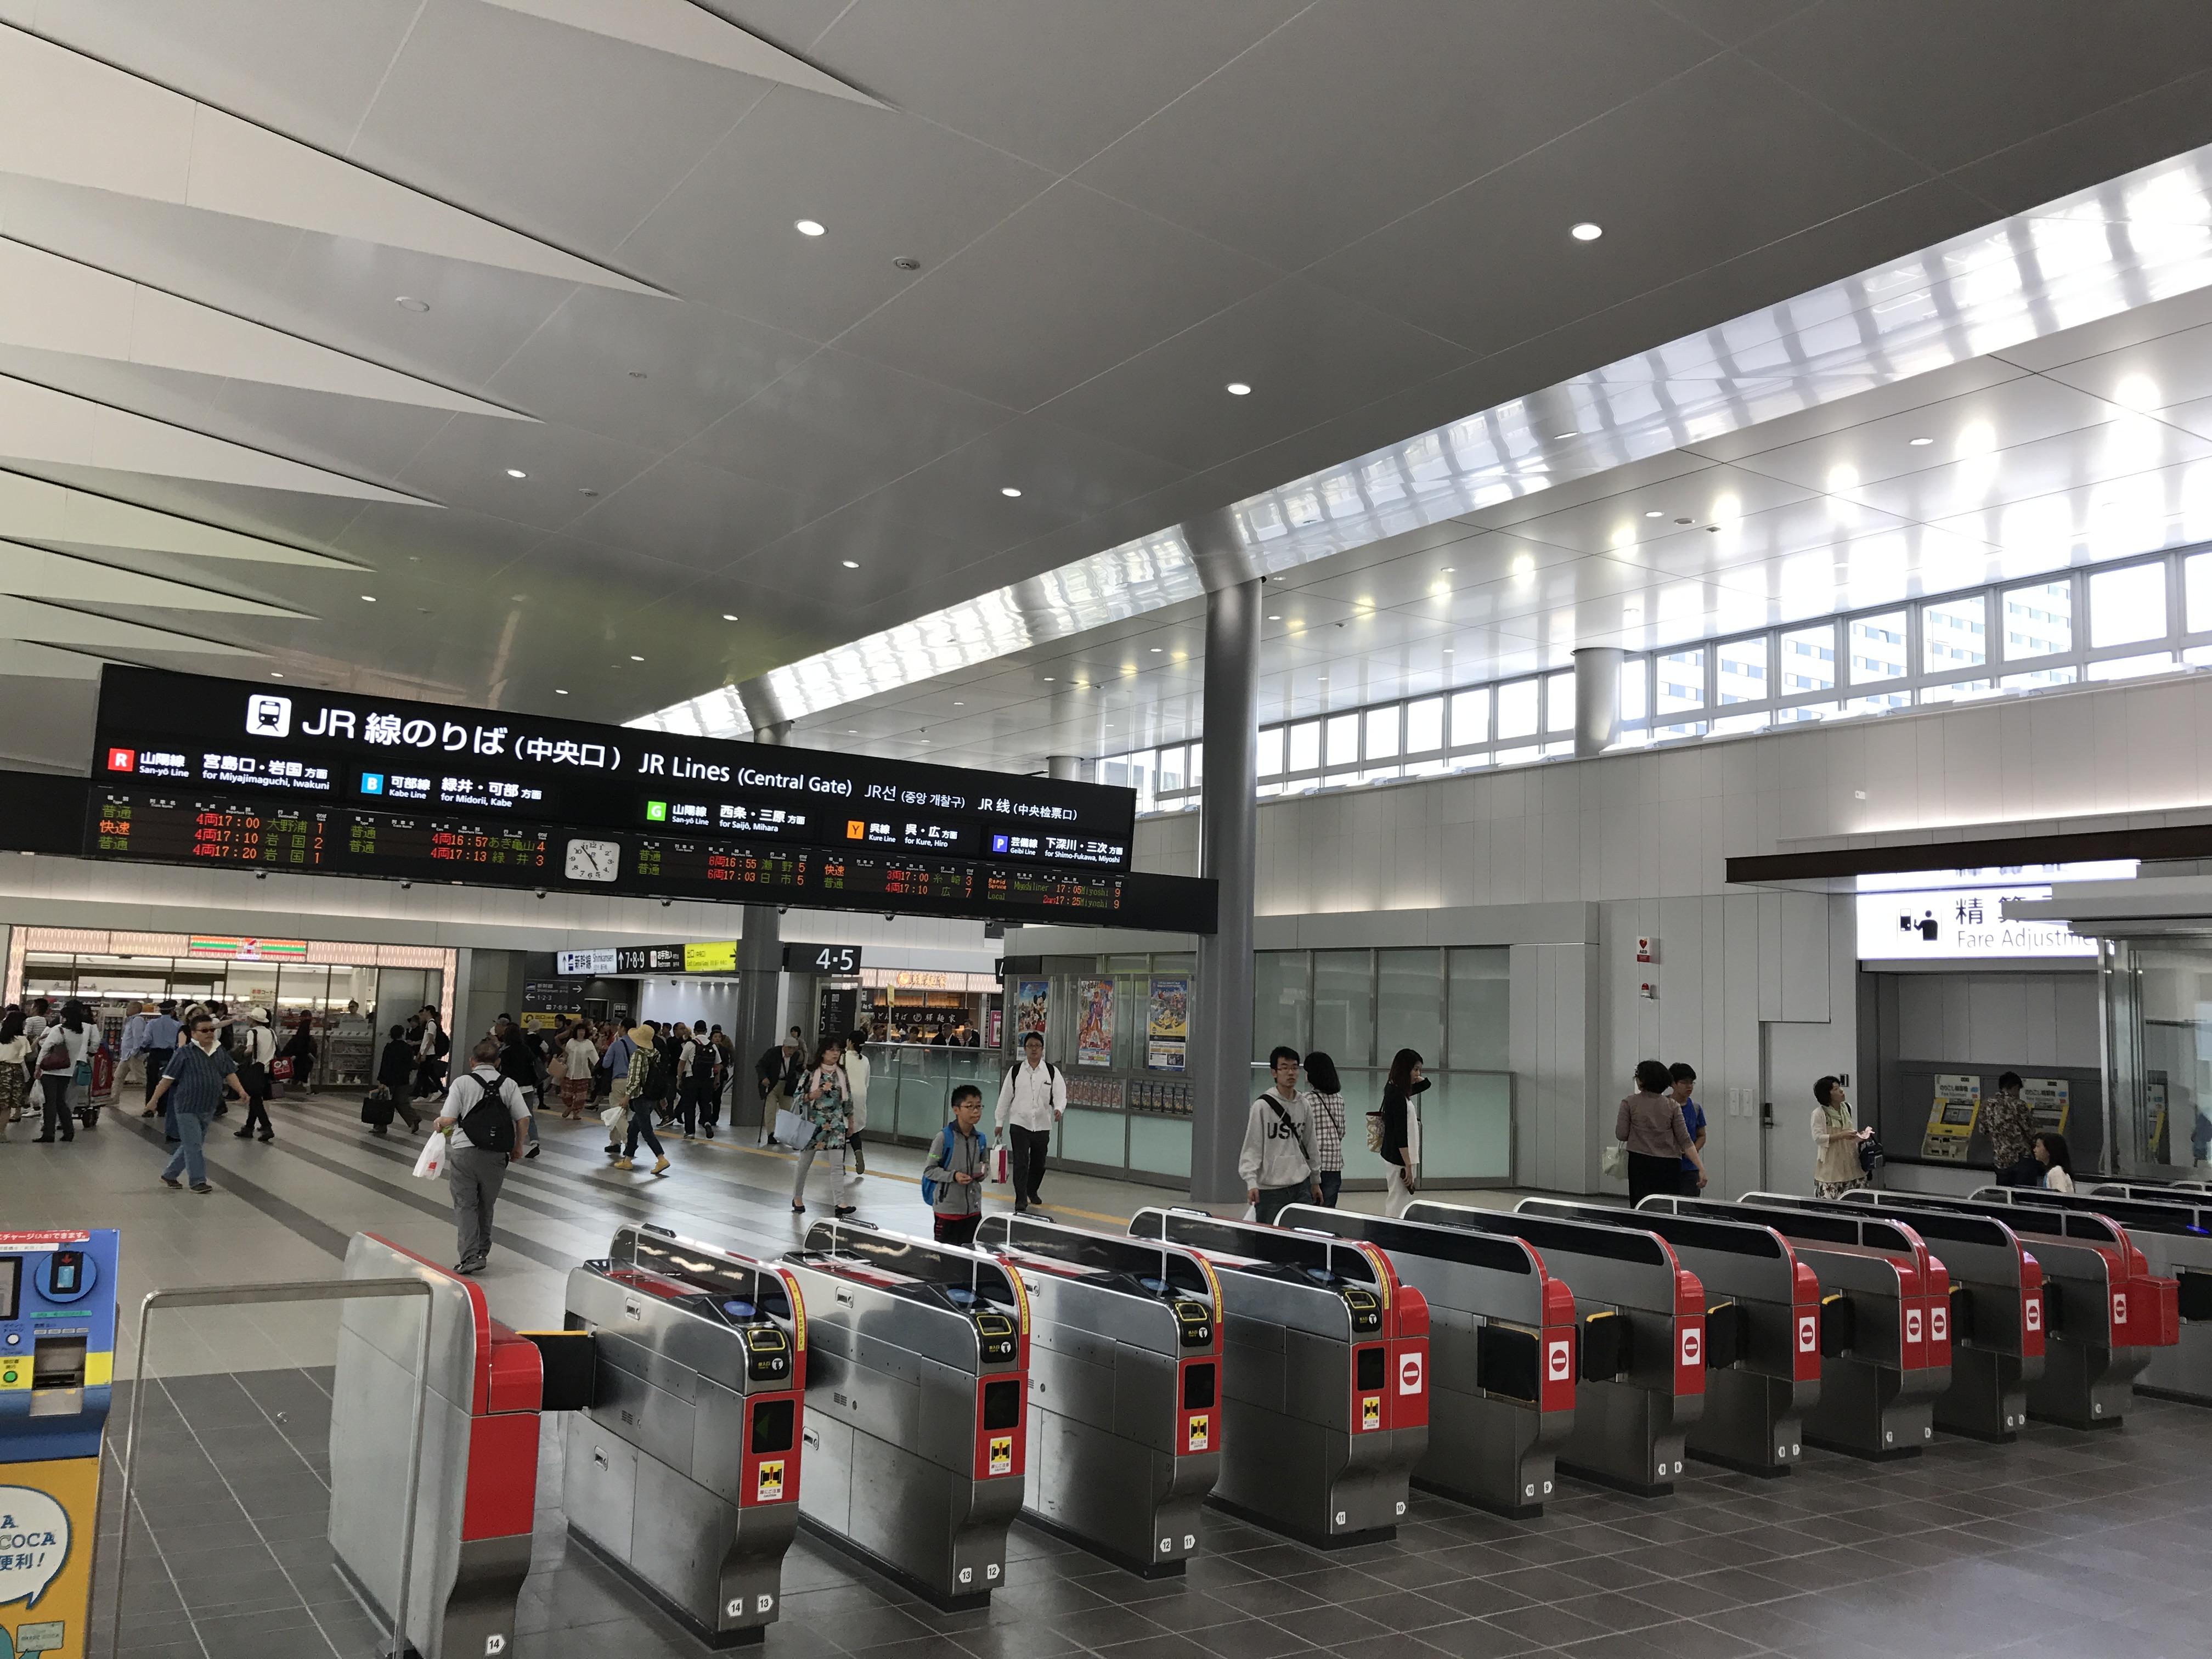 【Love 広島】広島駅の新しい中央口改札が2017年5月28日より始動!南北自由通路が開通!